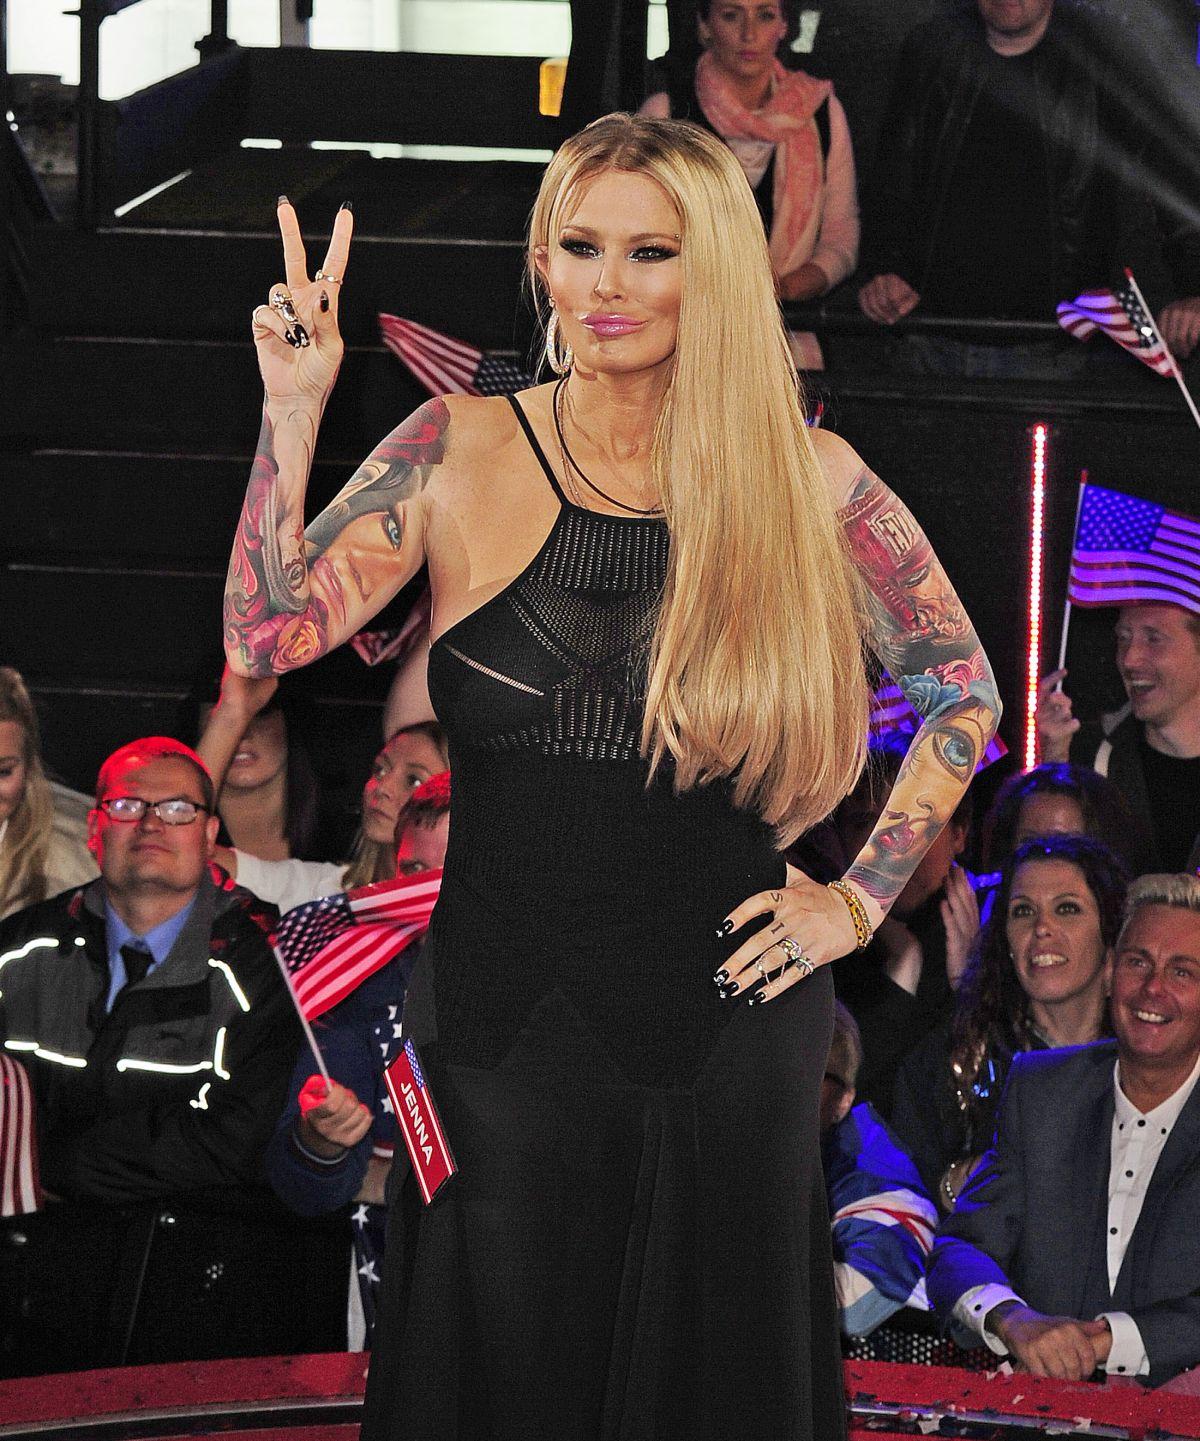 JENNA JEMSON Entering at UK Big Brother